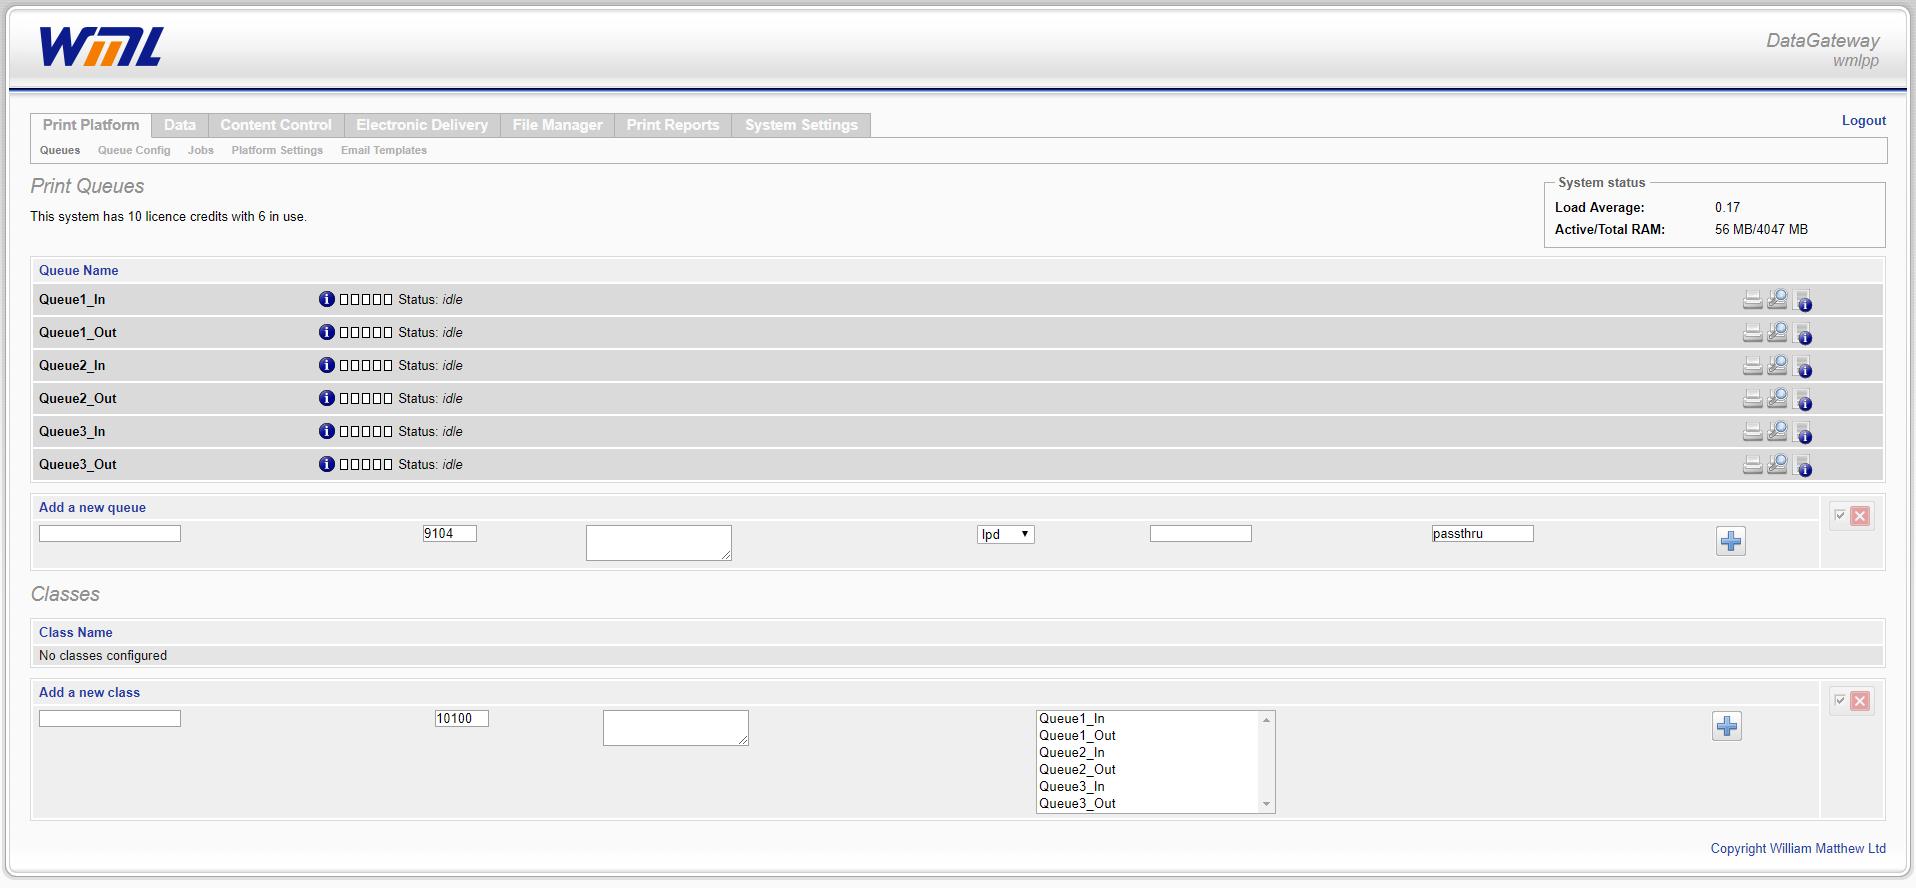 Datagateway_Queues